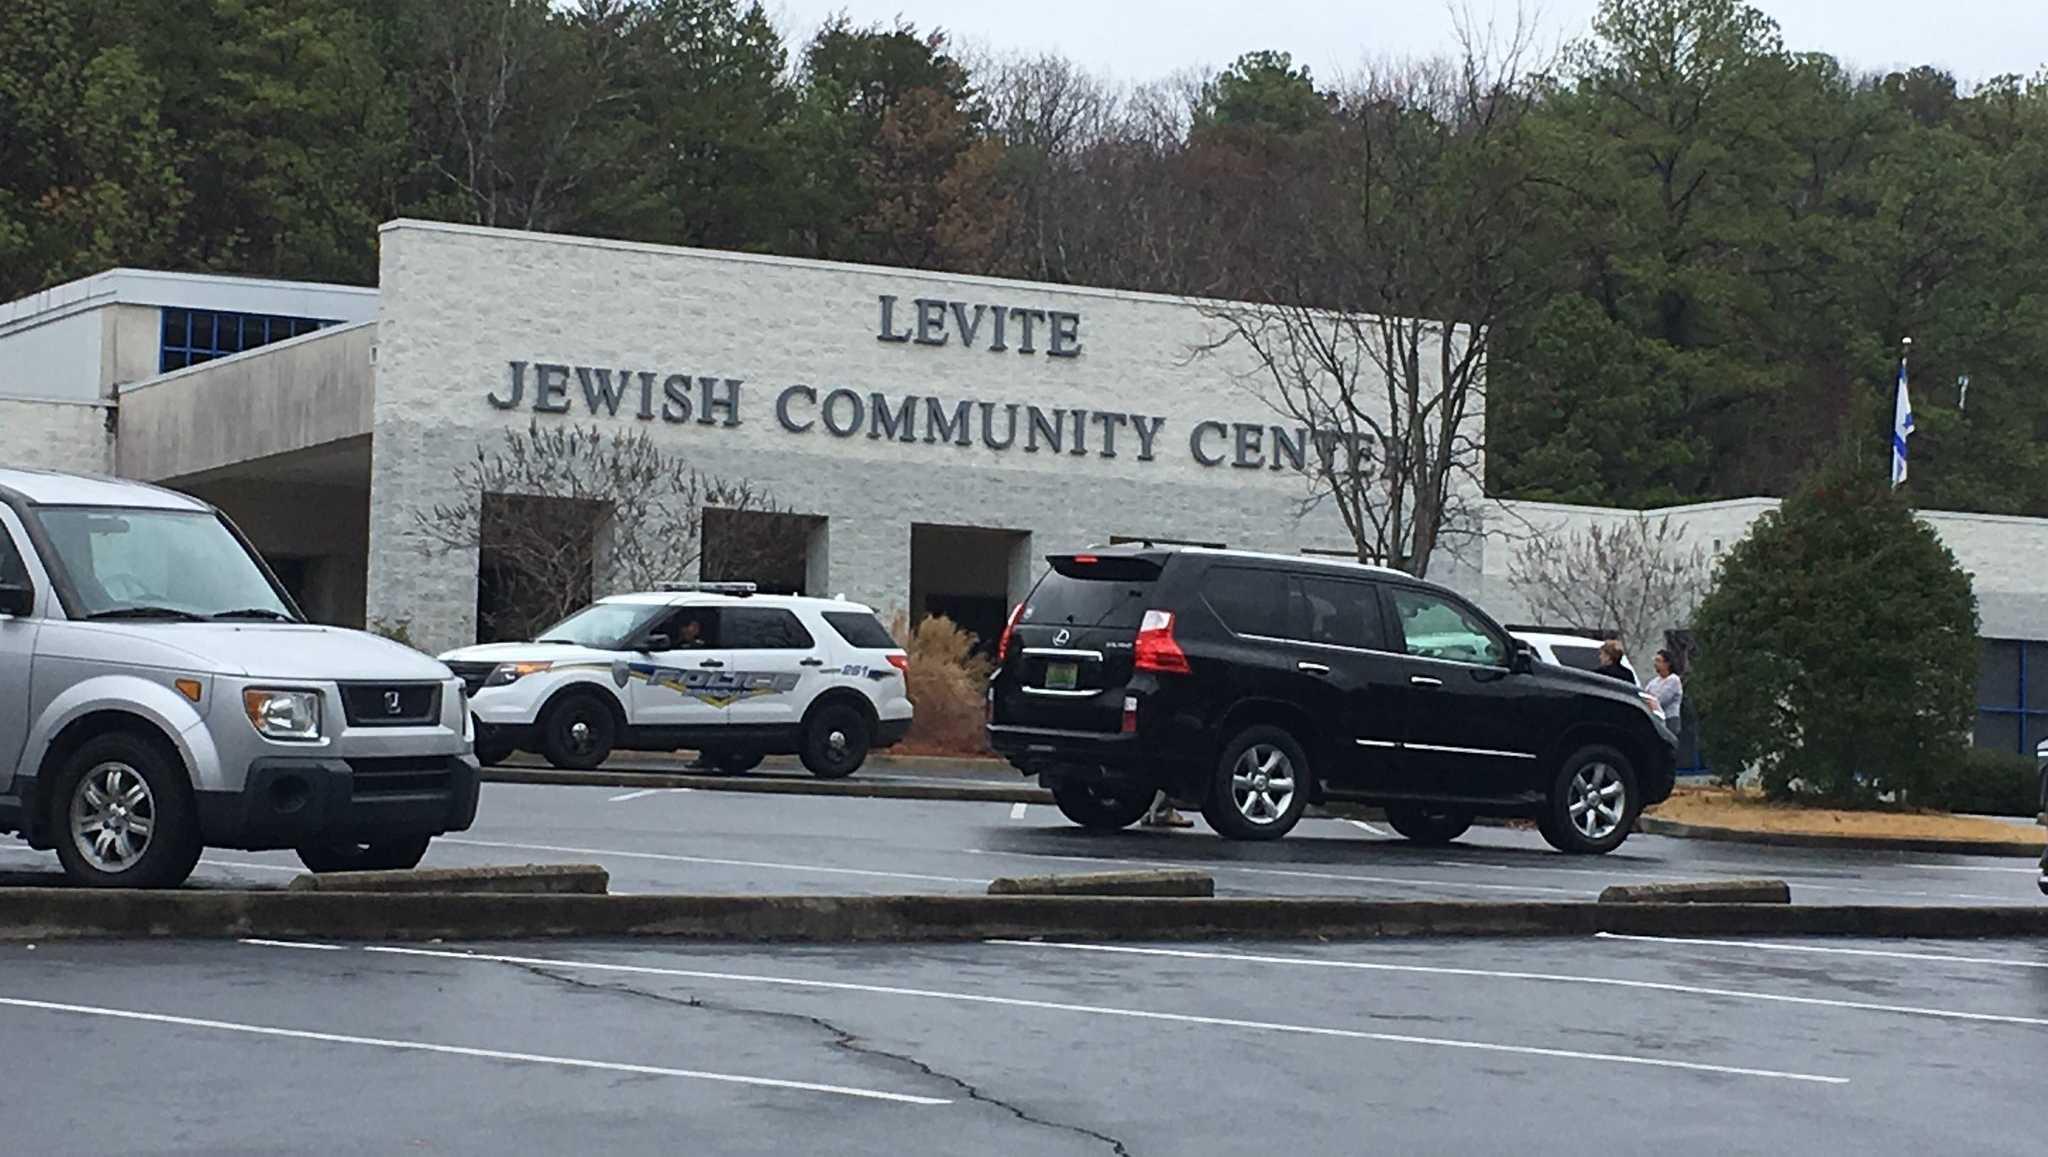 Jan. 18 bomb threat at Levite JCC in Birmingham